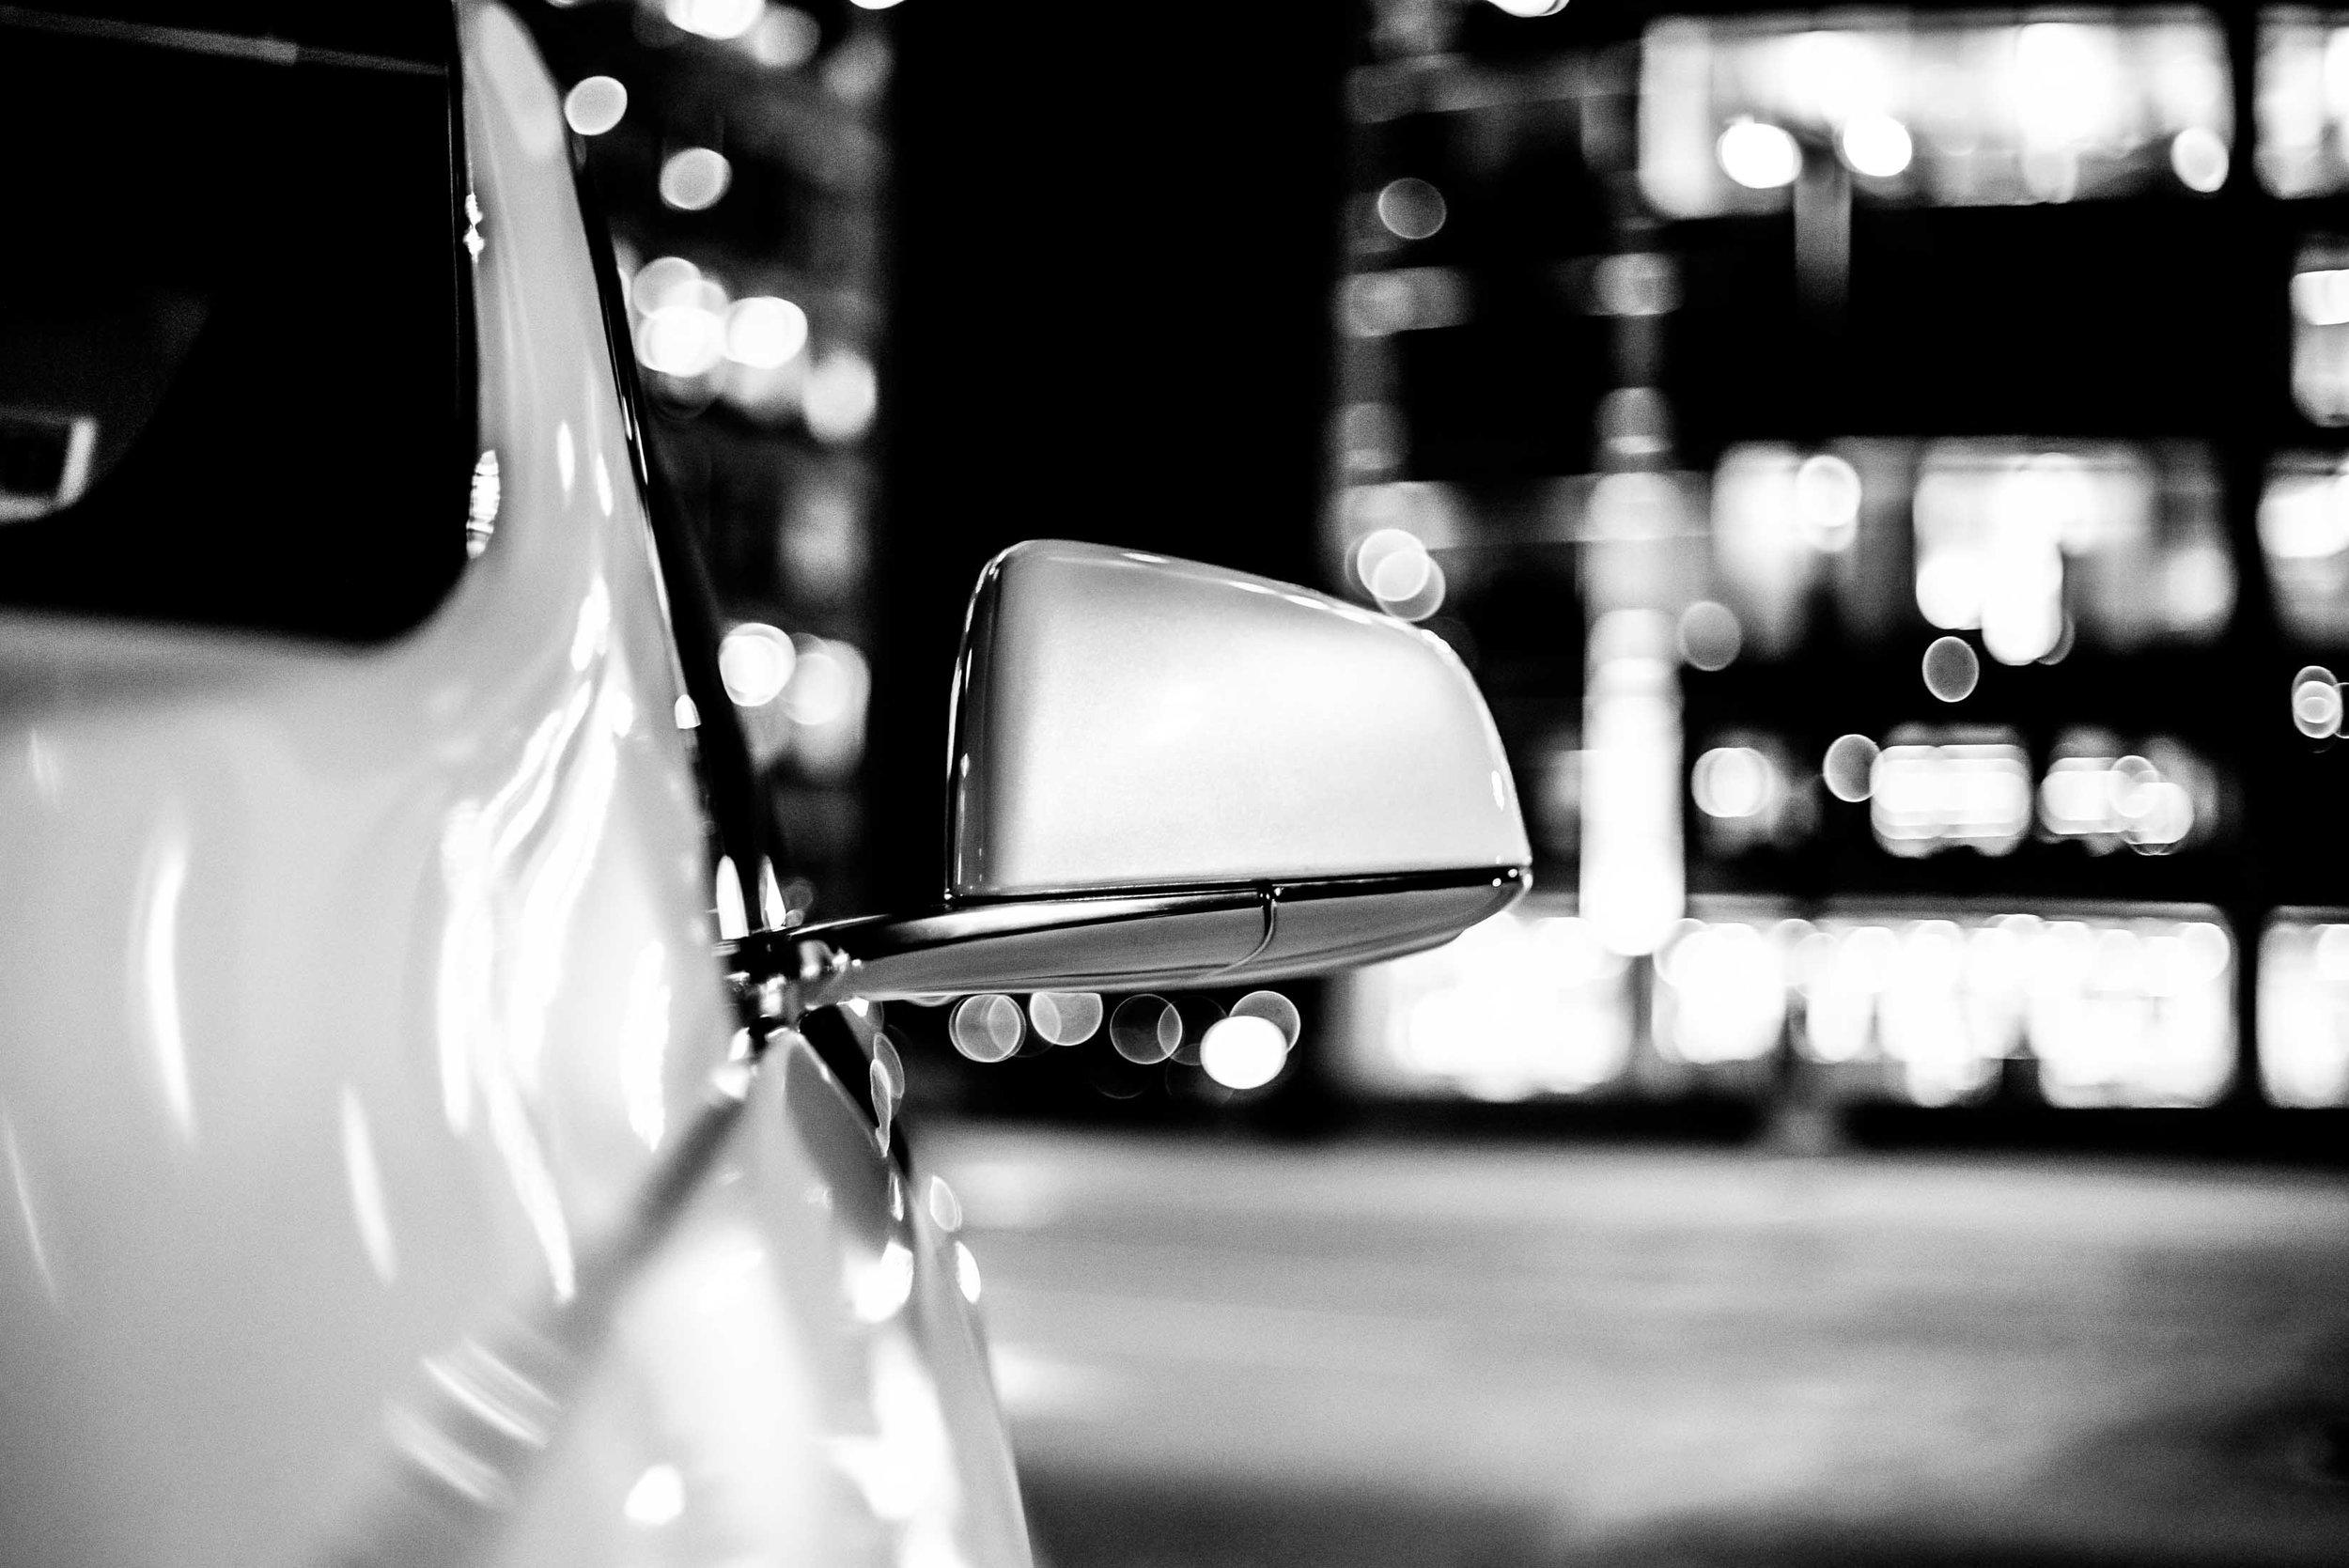 fleet+vehicle+sexy+car+photo+video+speed+tesla+p100d+vadym+guliuk+photography-11.jpg